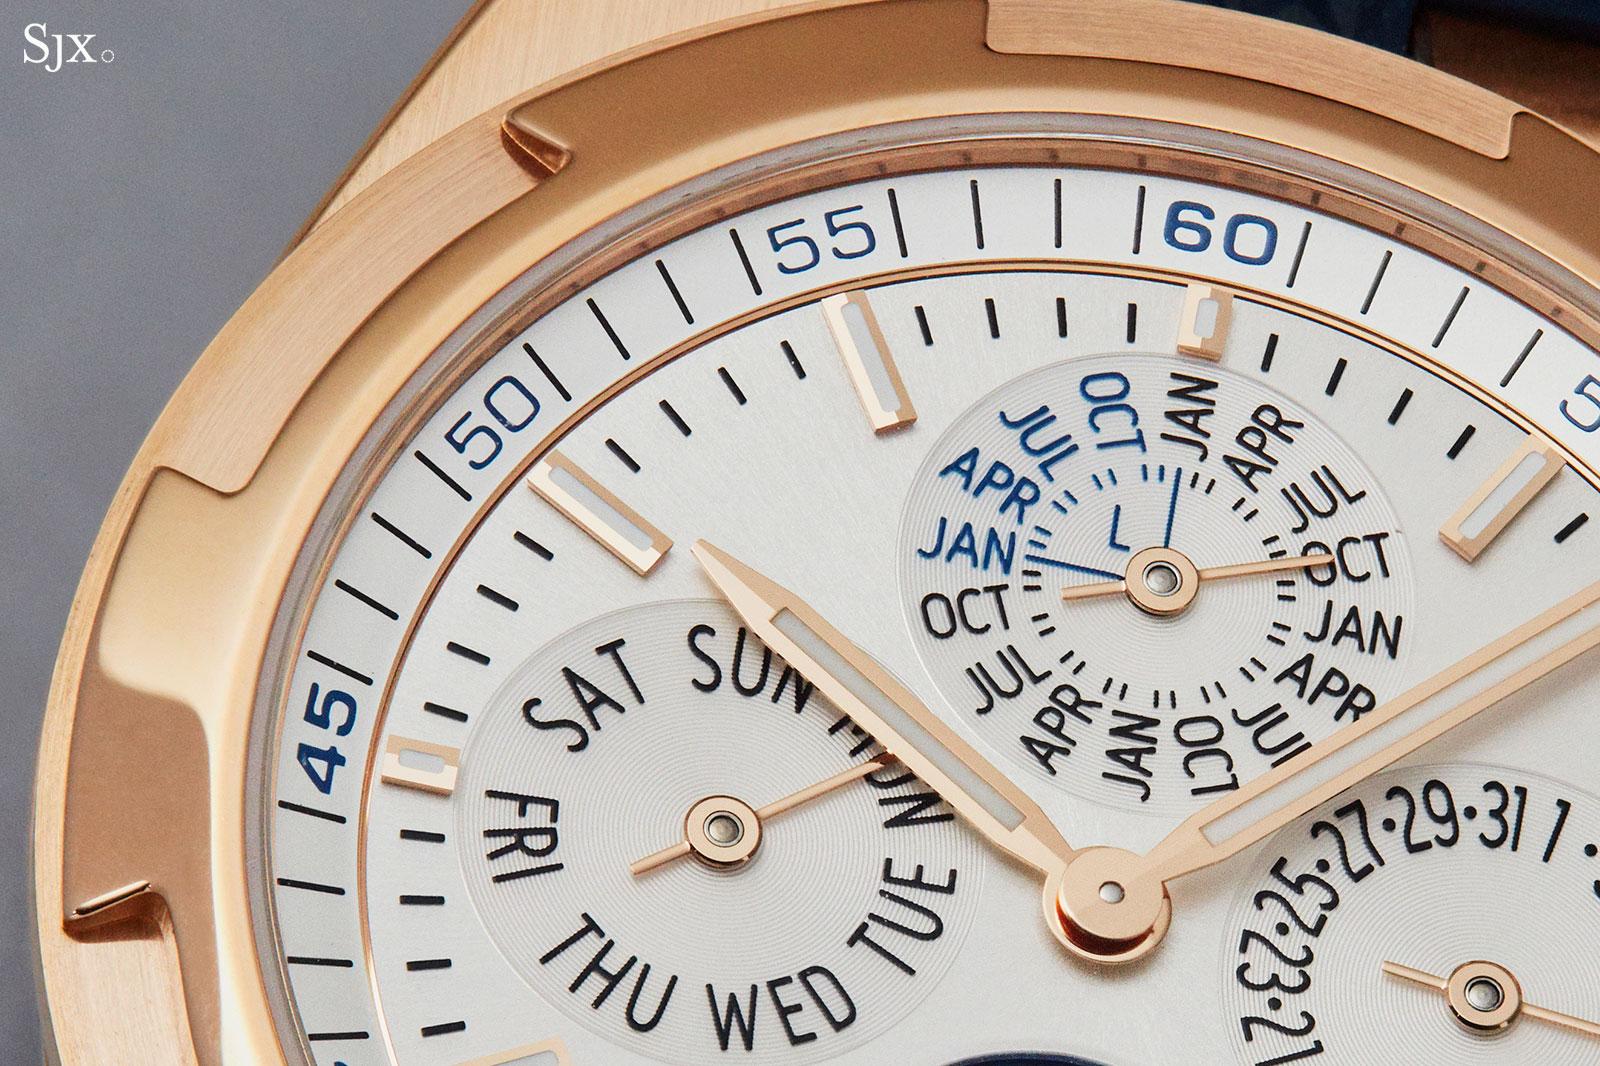 Vacheron Overseas Perpetual Calendar pink gold 3